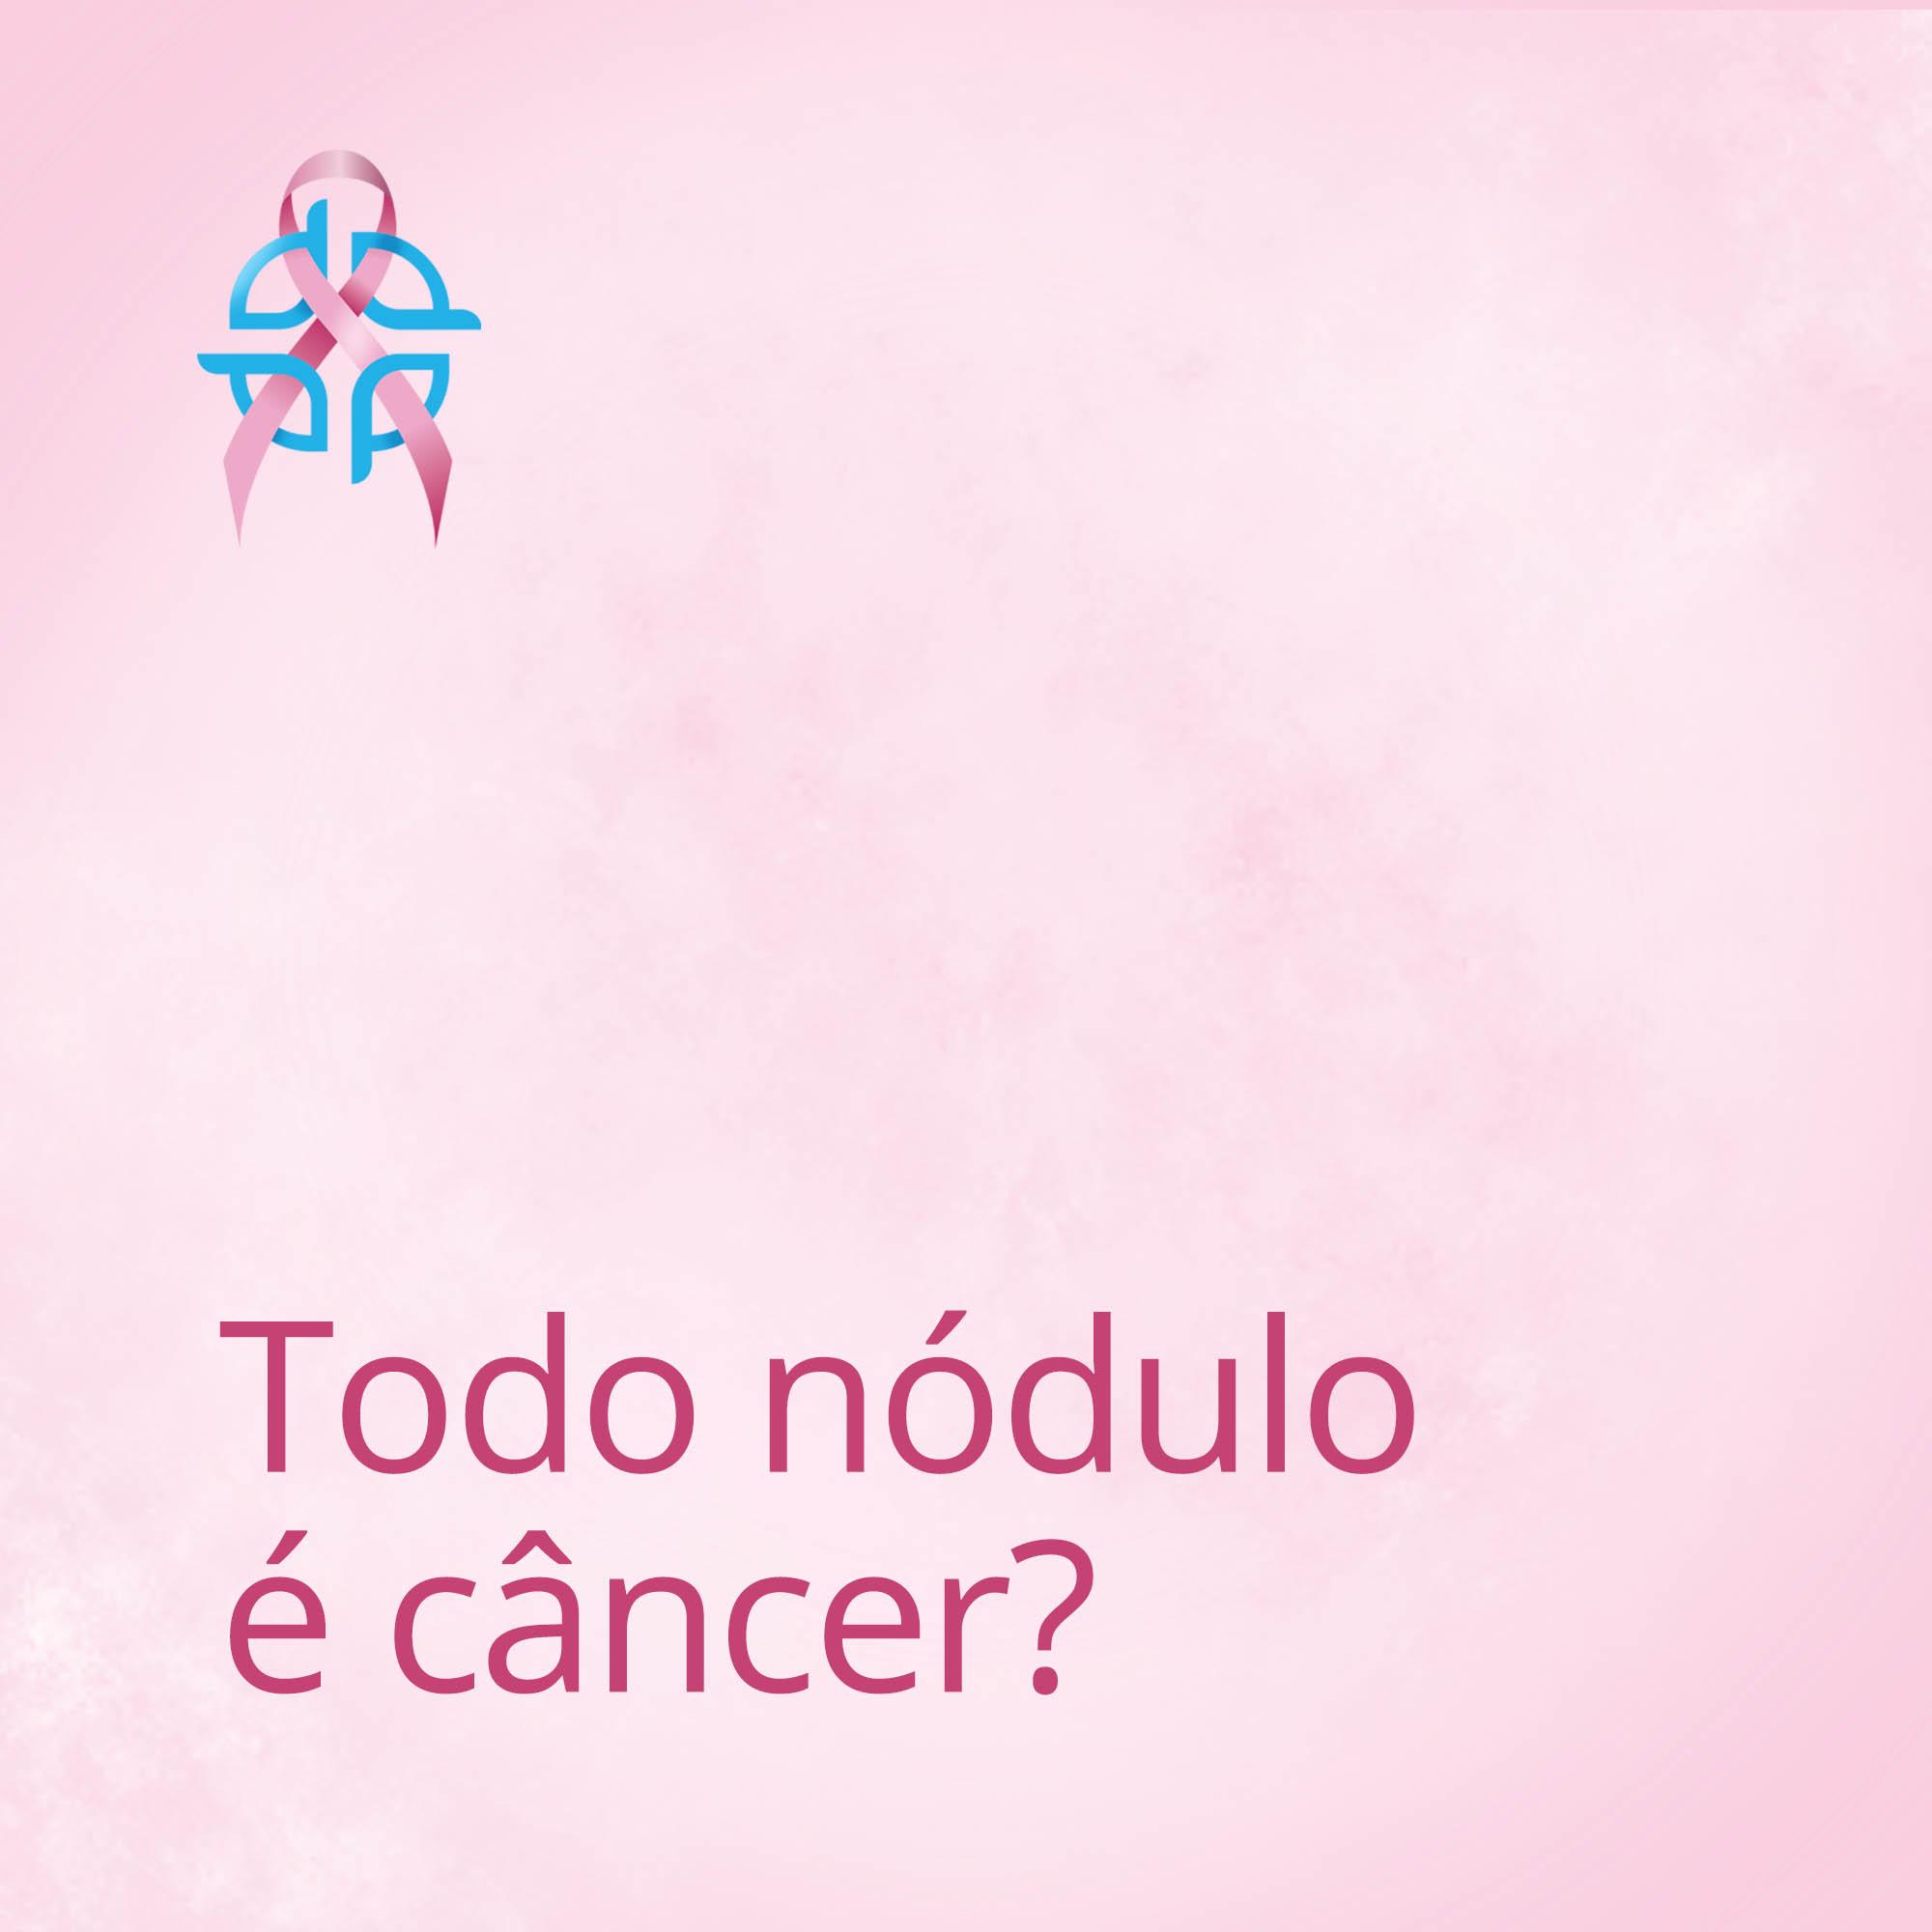 Todo nódulo é câncer?